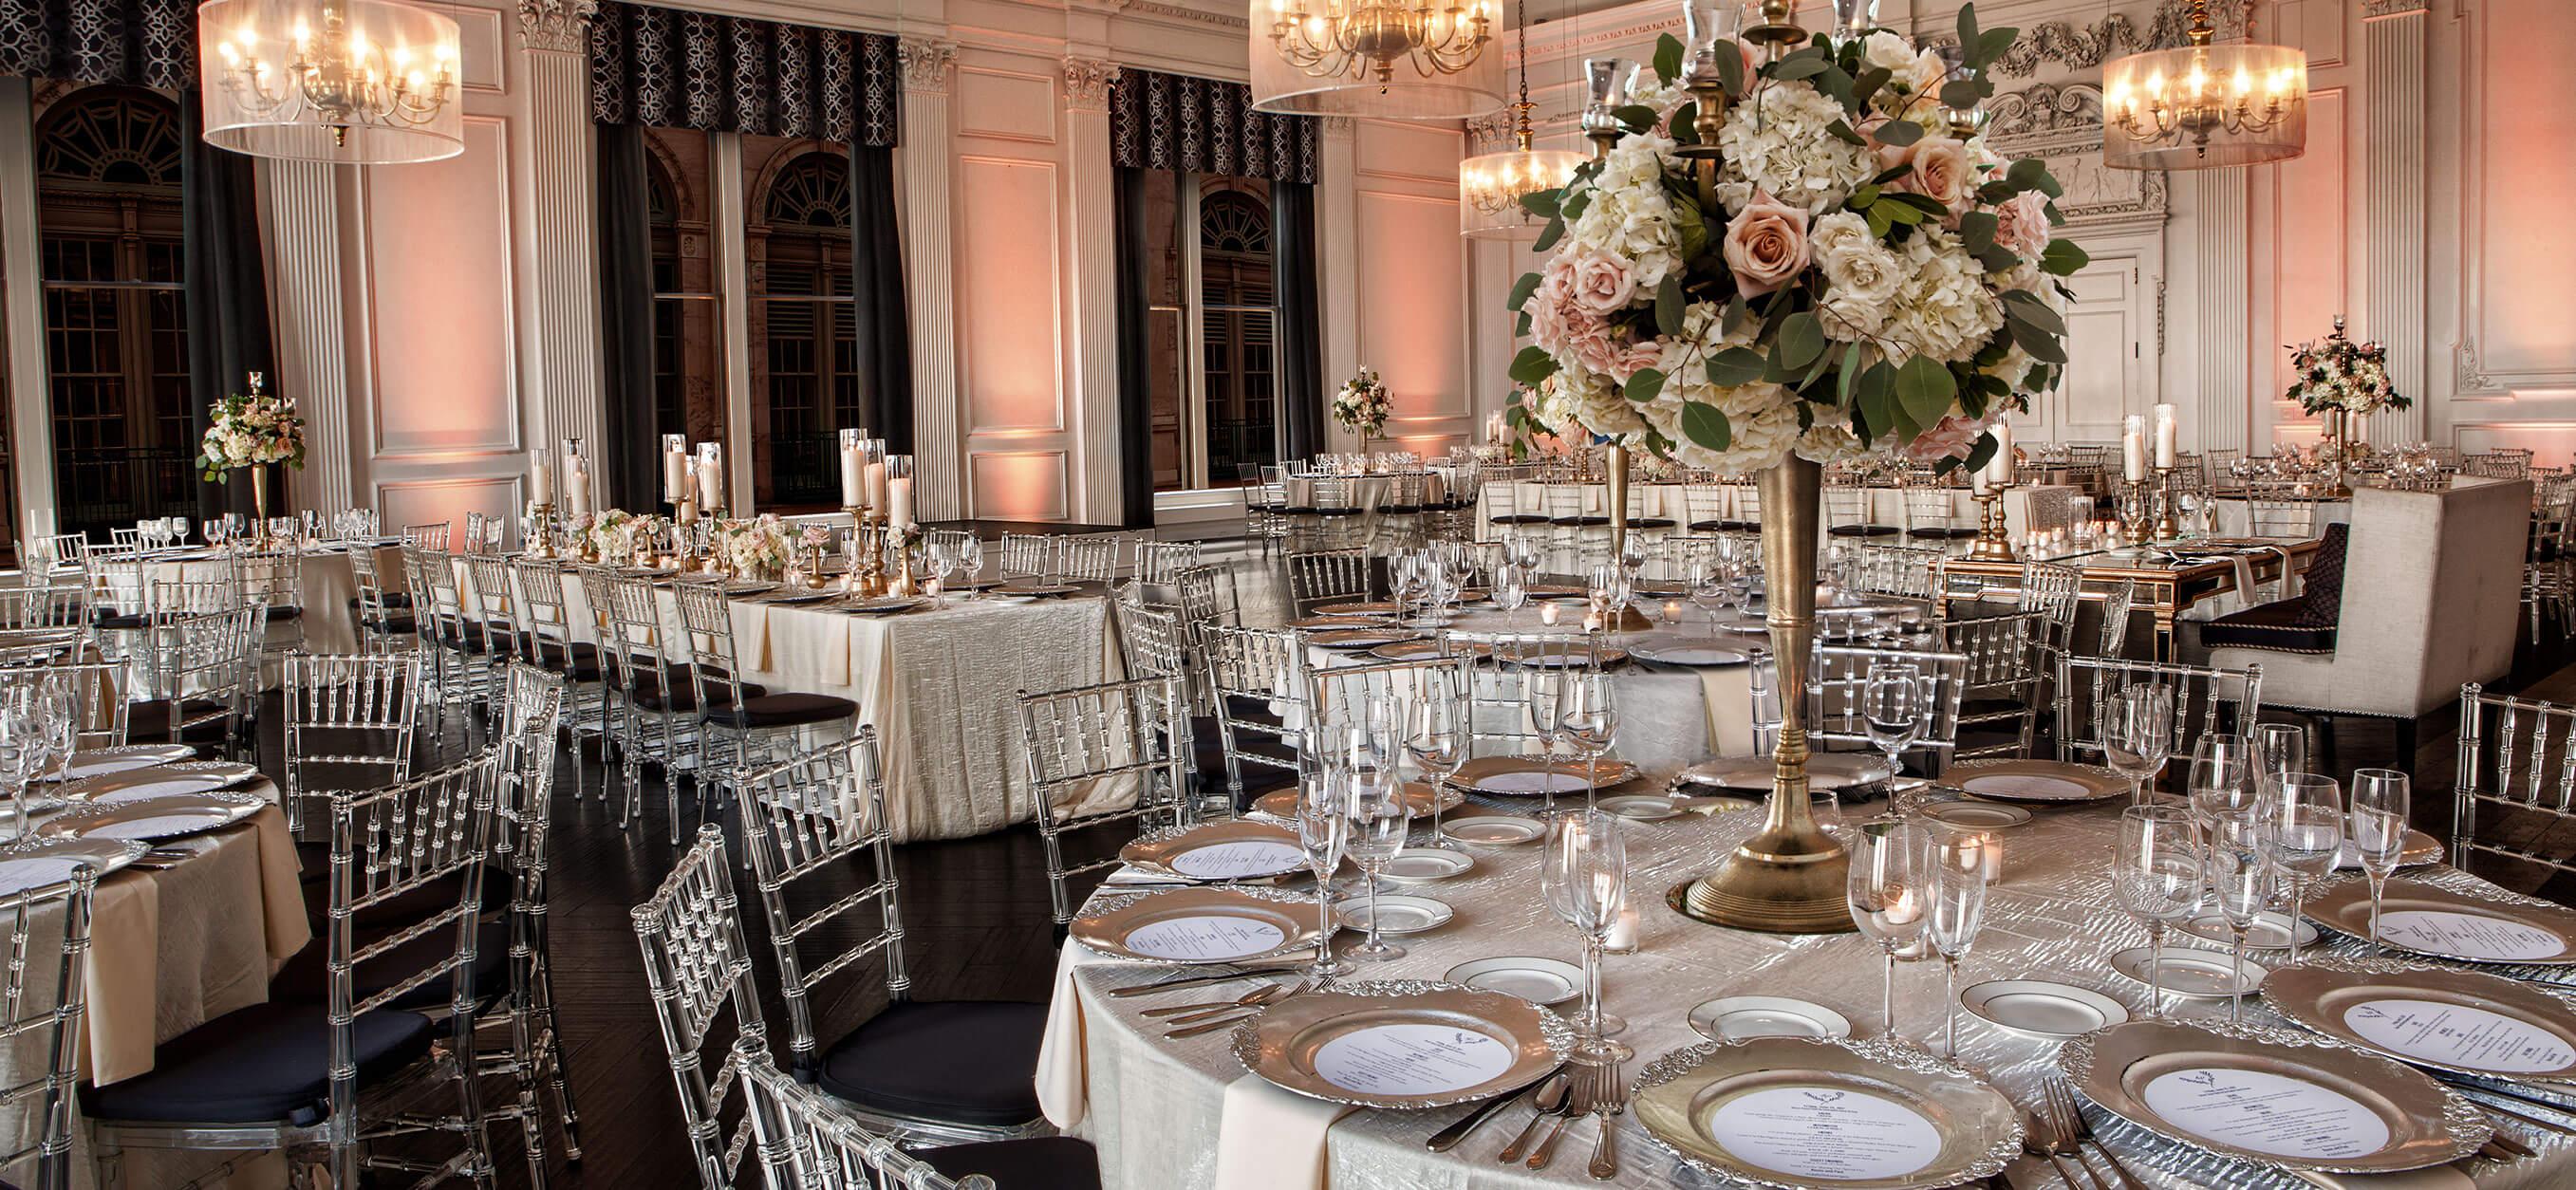 Down Town Club Cescaphe Weddings Philadelphia Wedding Services